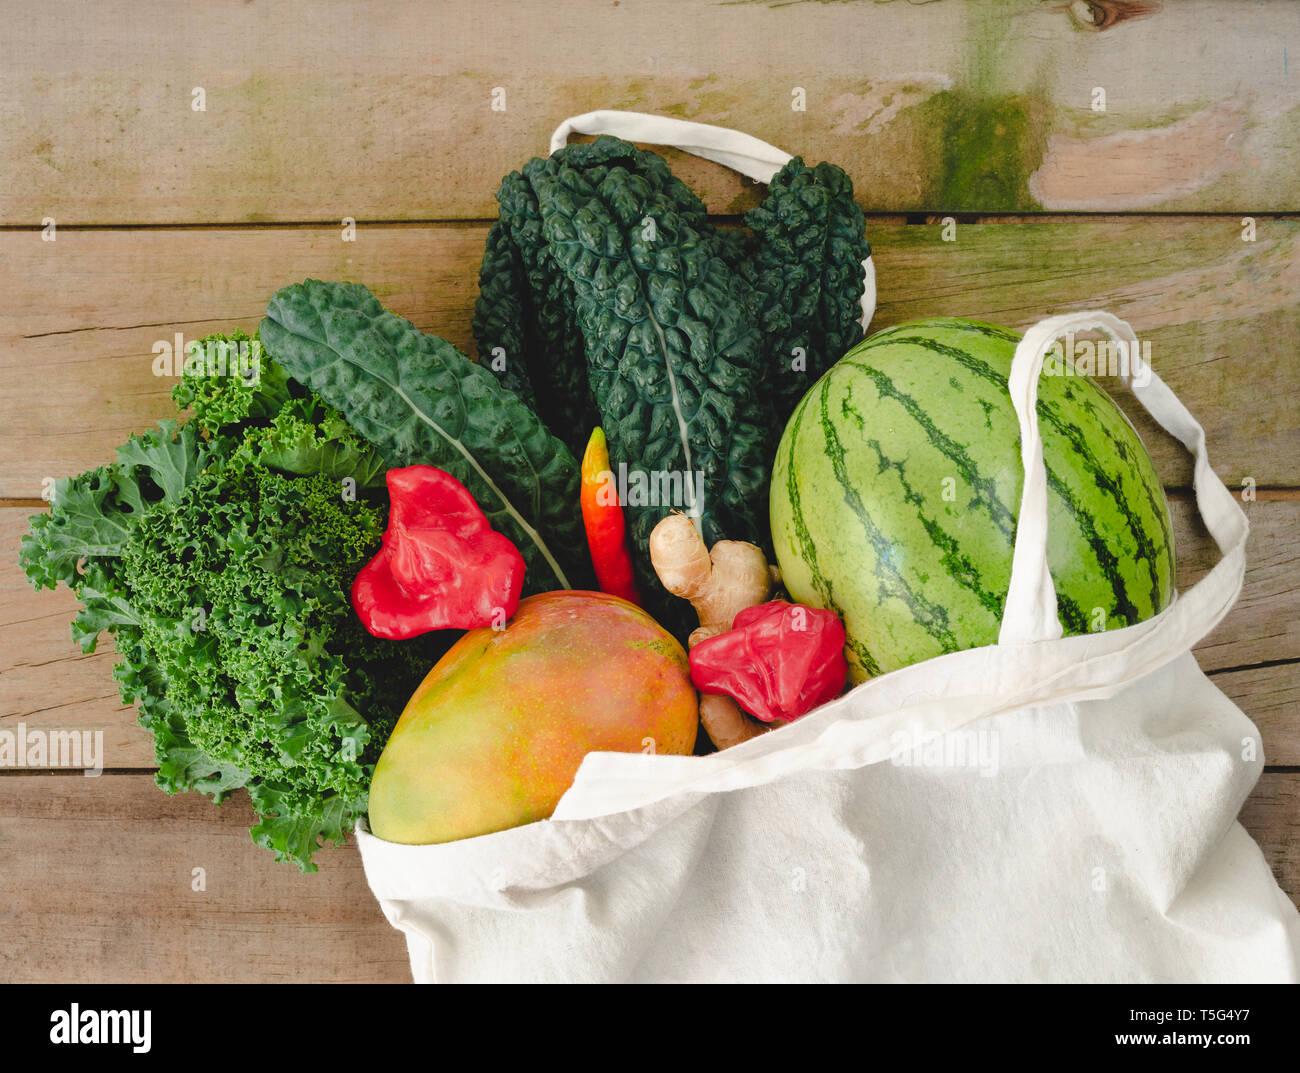 7667cd900 Bolsa de tela ecológica con verduras sobre fondo de madera de estilo  rústico. Vista desde